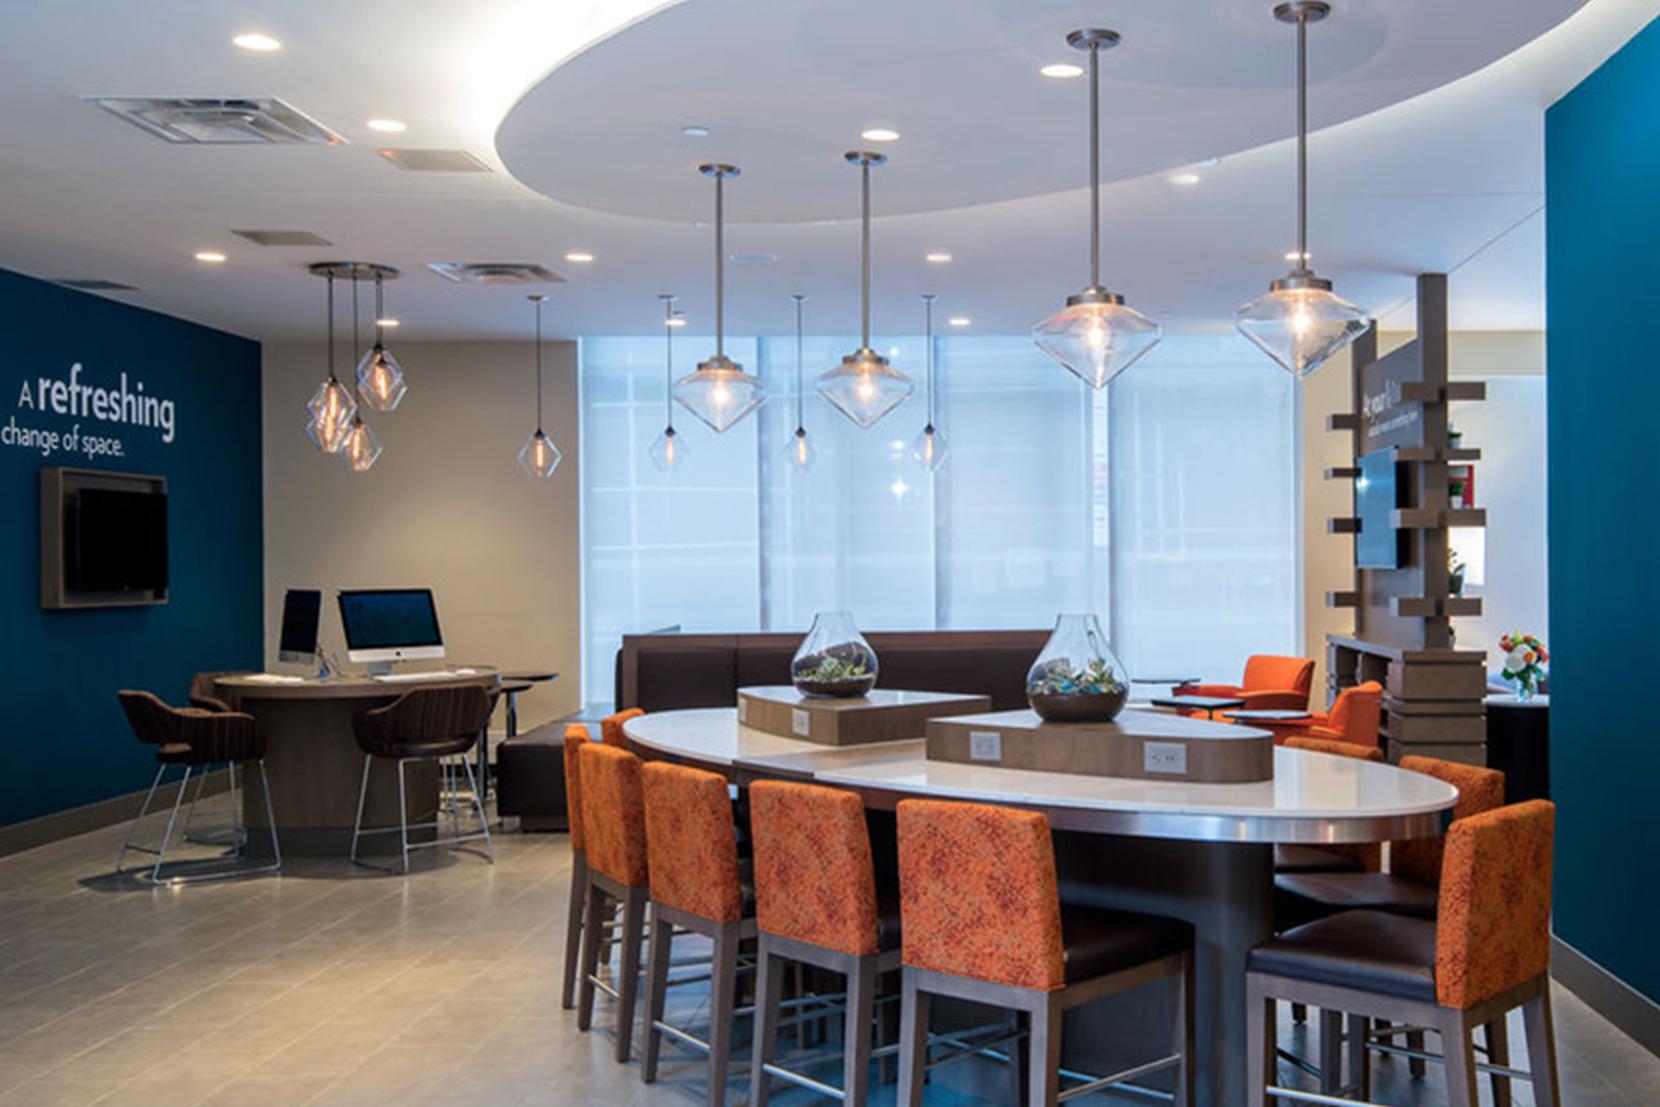 Modern-Workspace-Lighting-In-Even-Hotel-Brooklyn.png